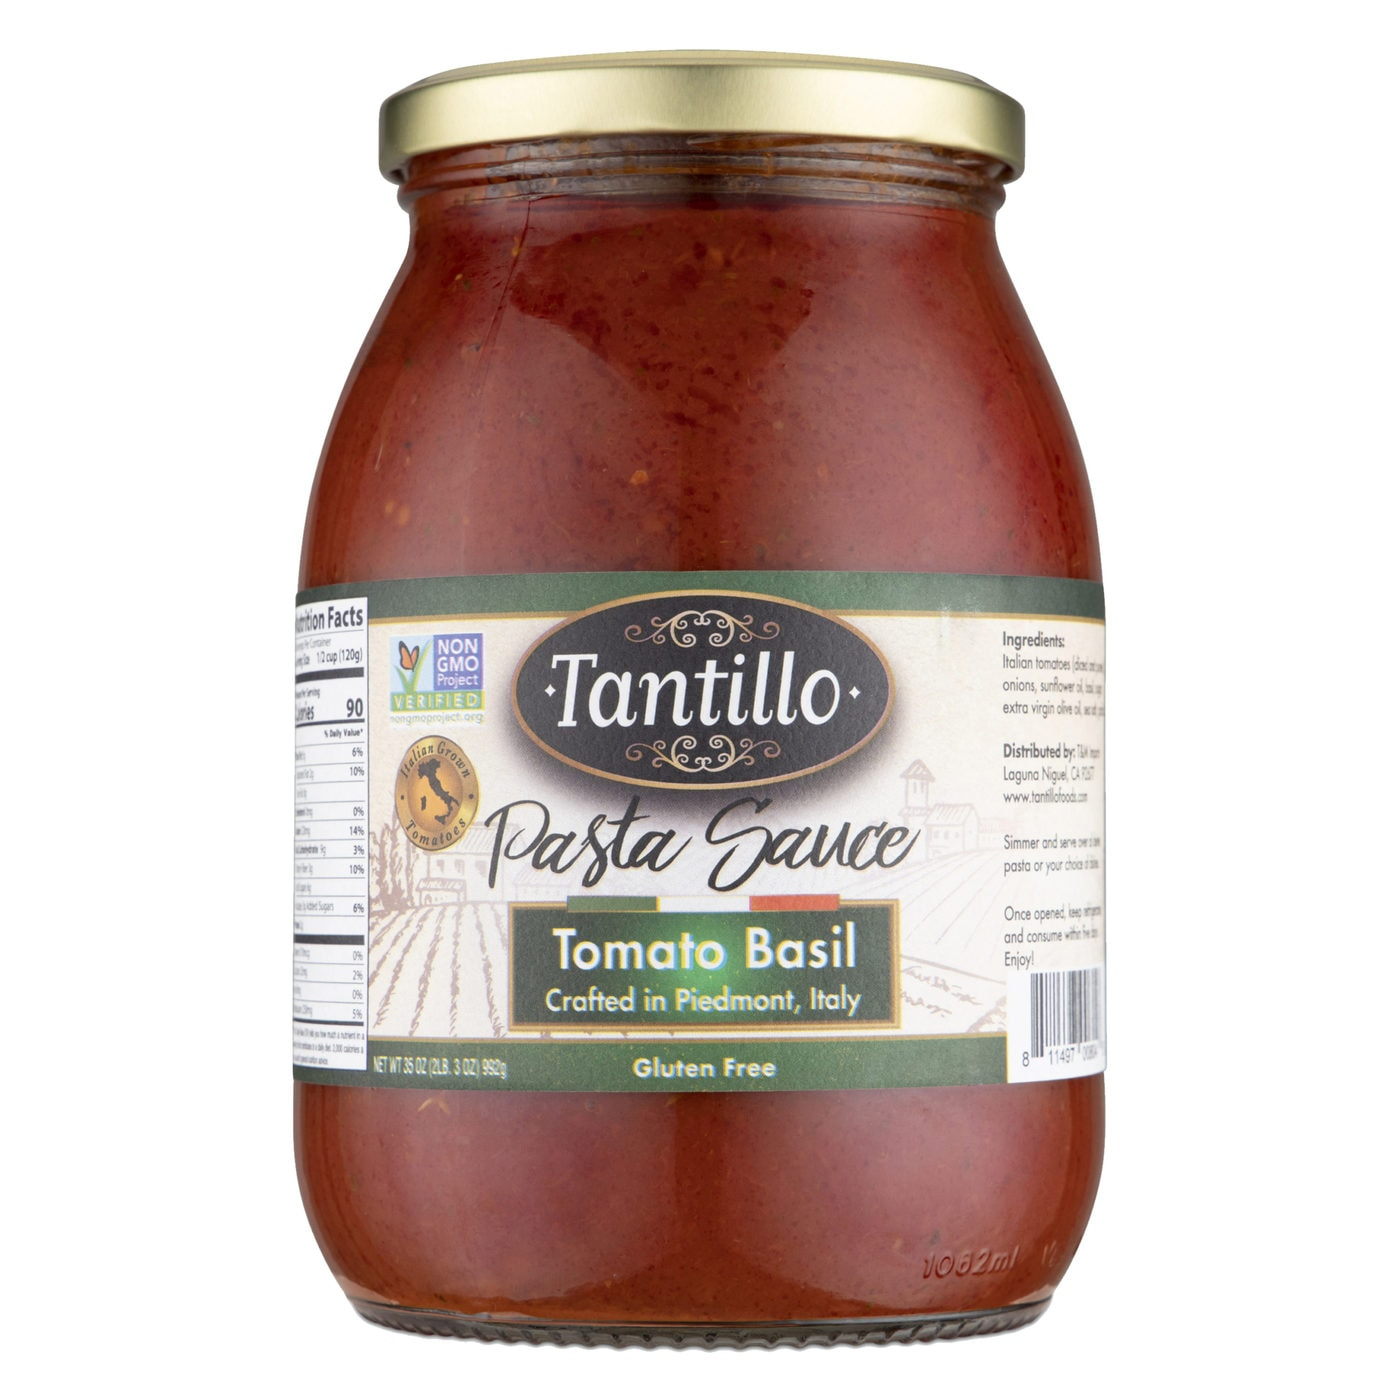 Tantillo Imported Italian Tomato Basil Pasta Sauce 35oz (Pack of 2)